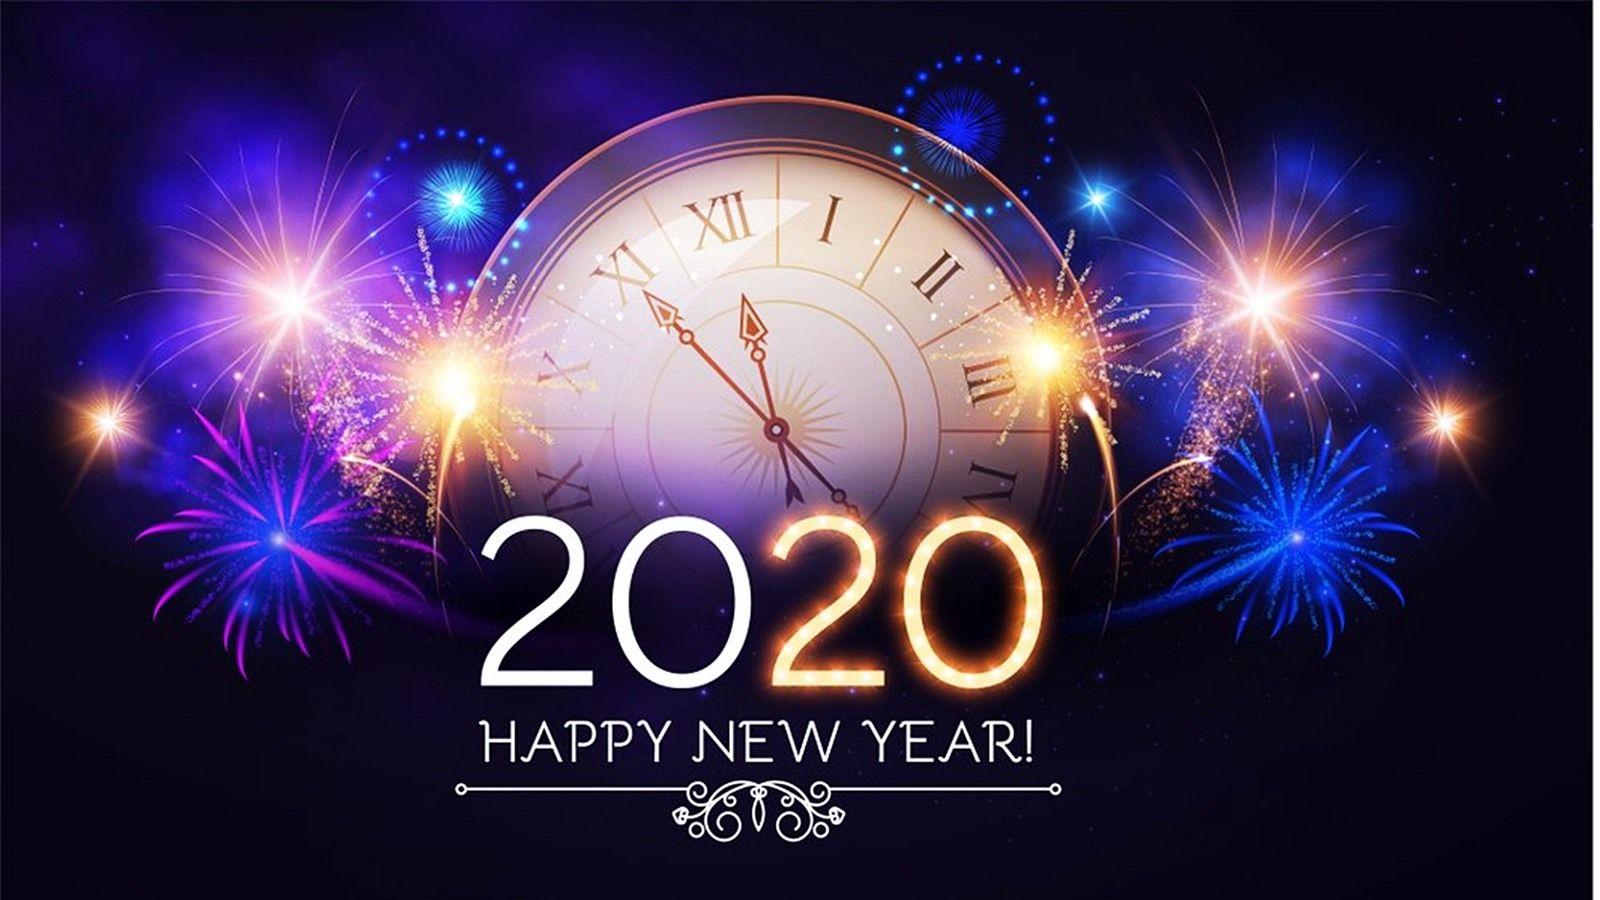 appy-New-Year-2020-High-Definition-Wallpaper-45552.jpg